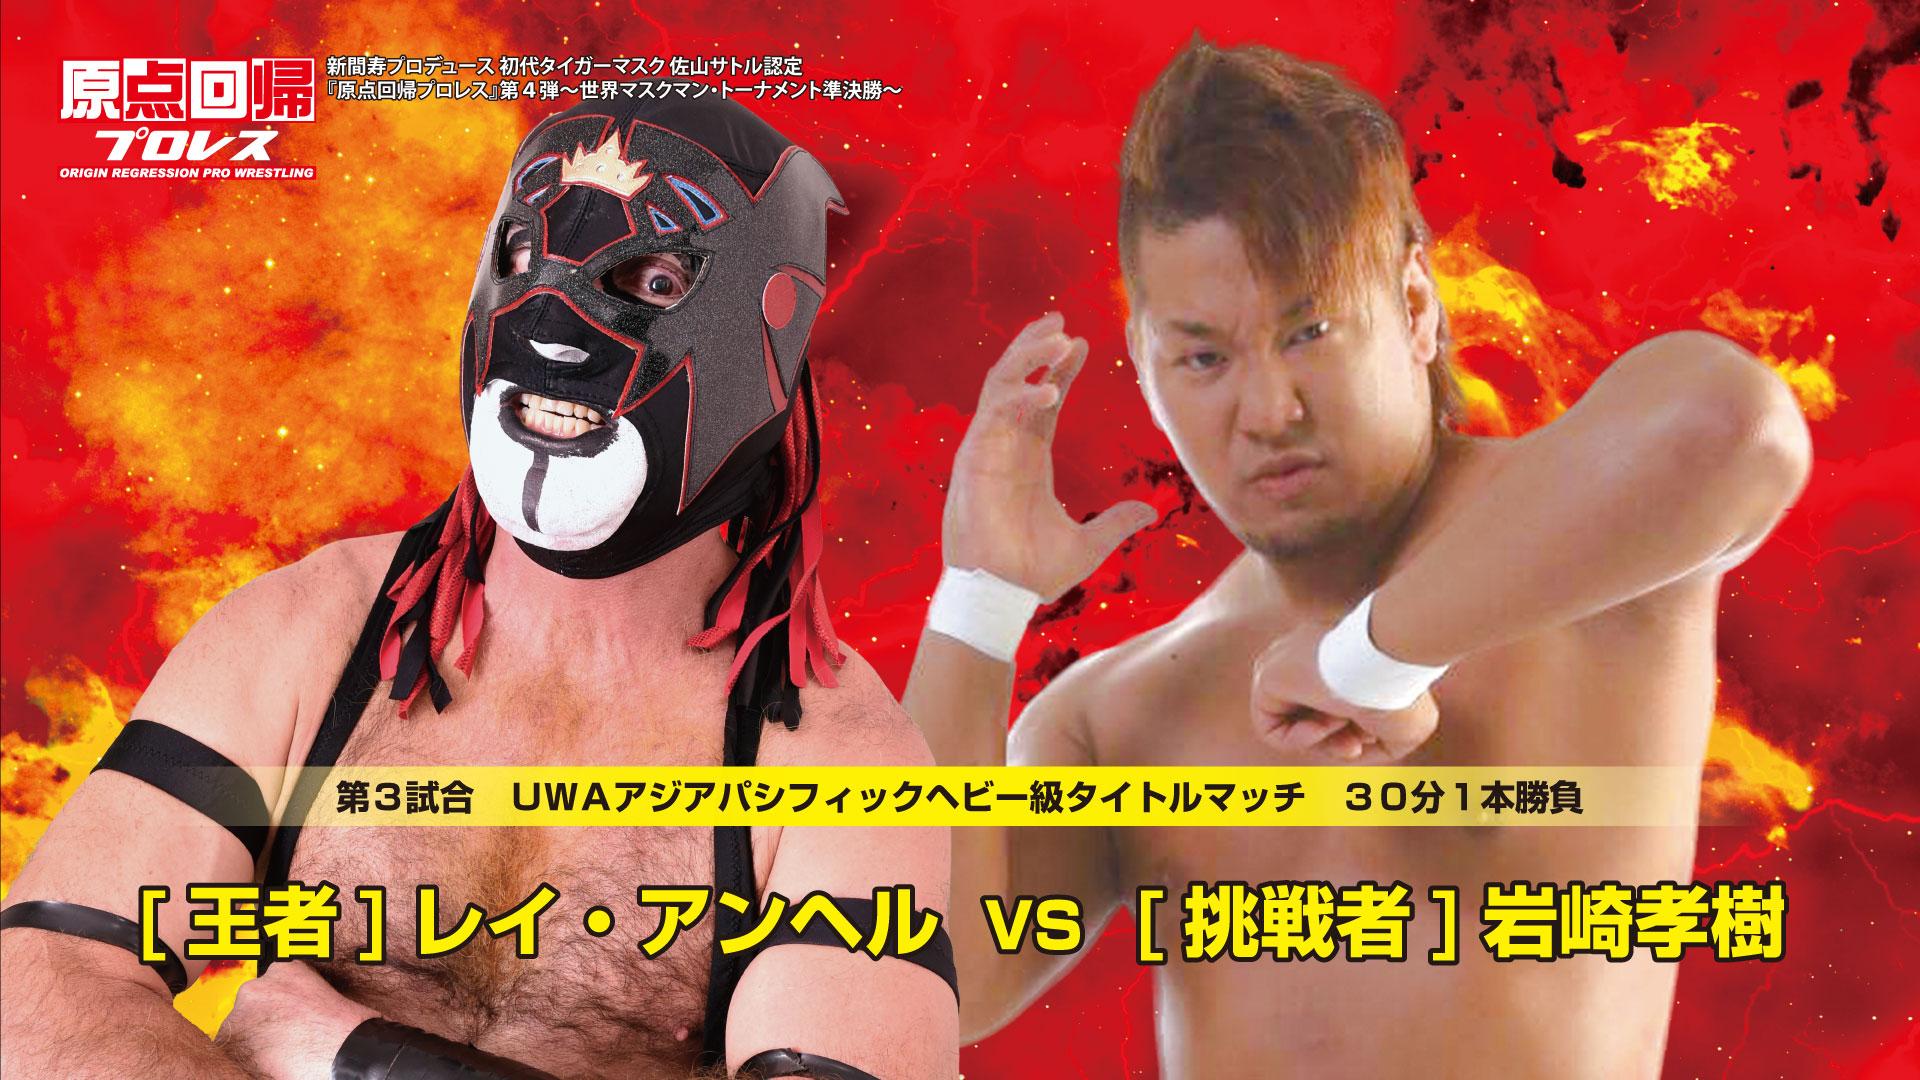 Resultado de imagen para エル・ペロ・デ・アキータ wrestler